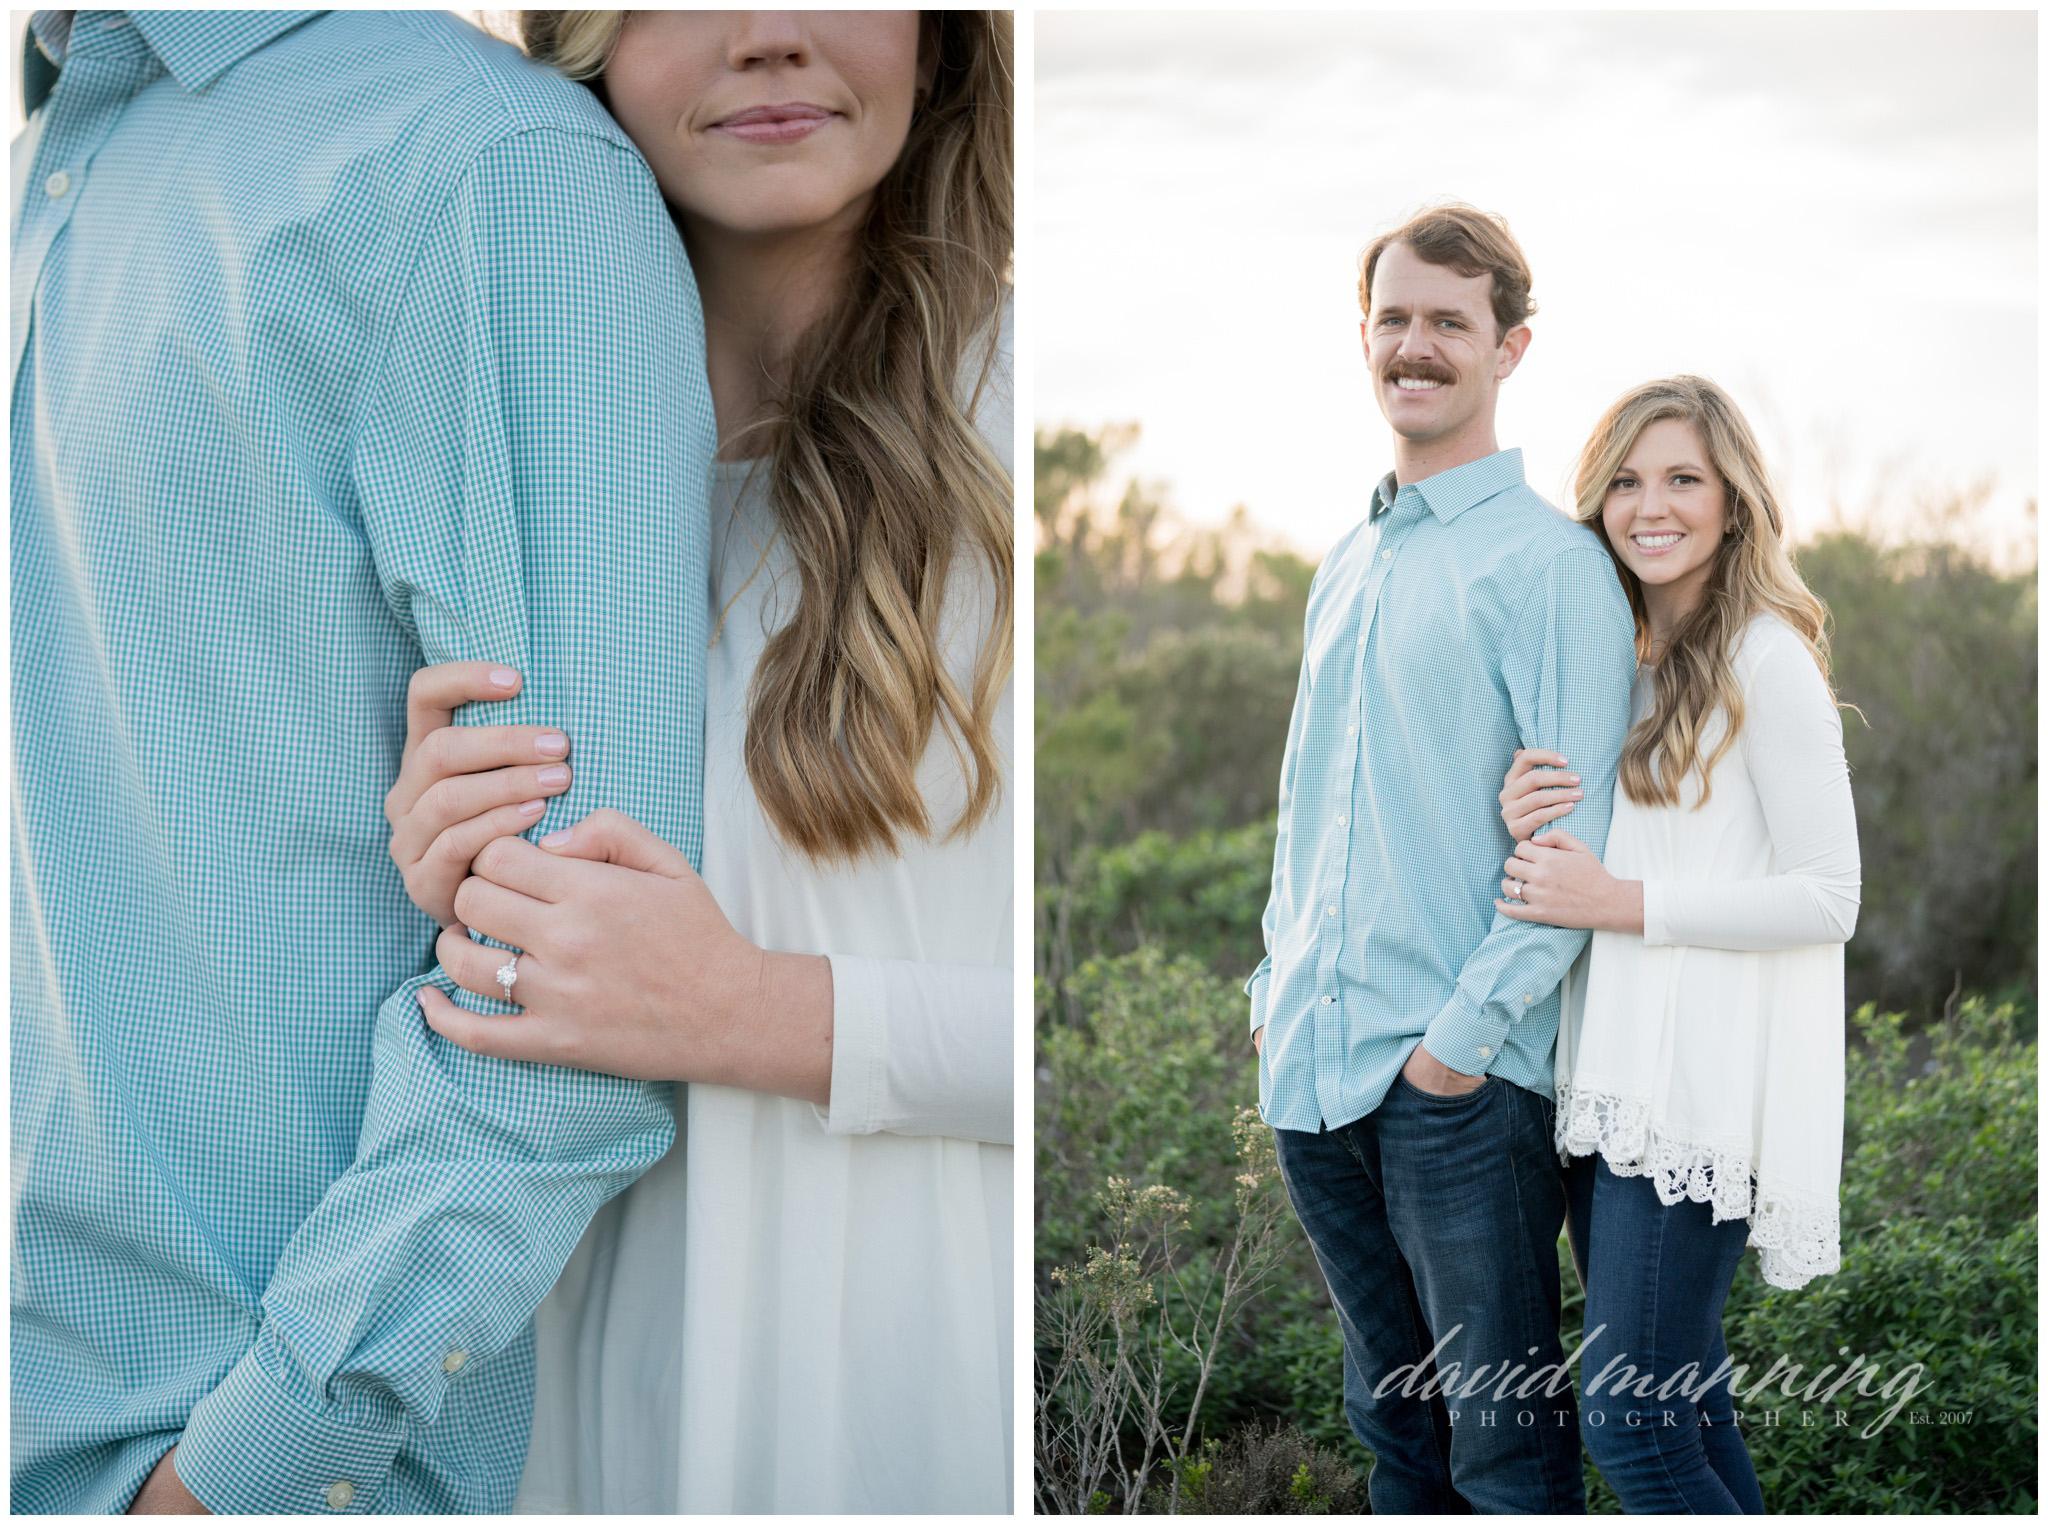 Alyssa-Taylor-Engagement-David-Manning-Photographer-0129.JPG